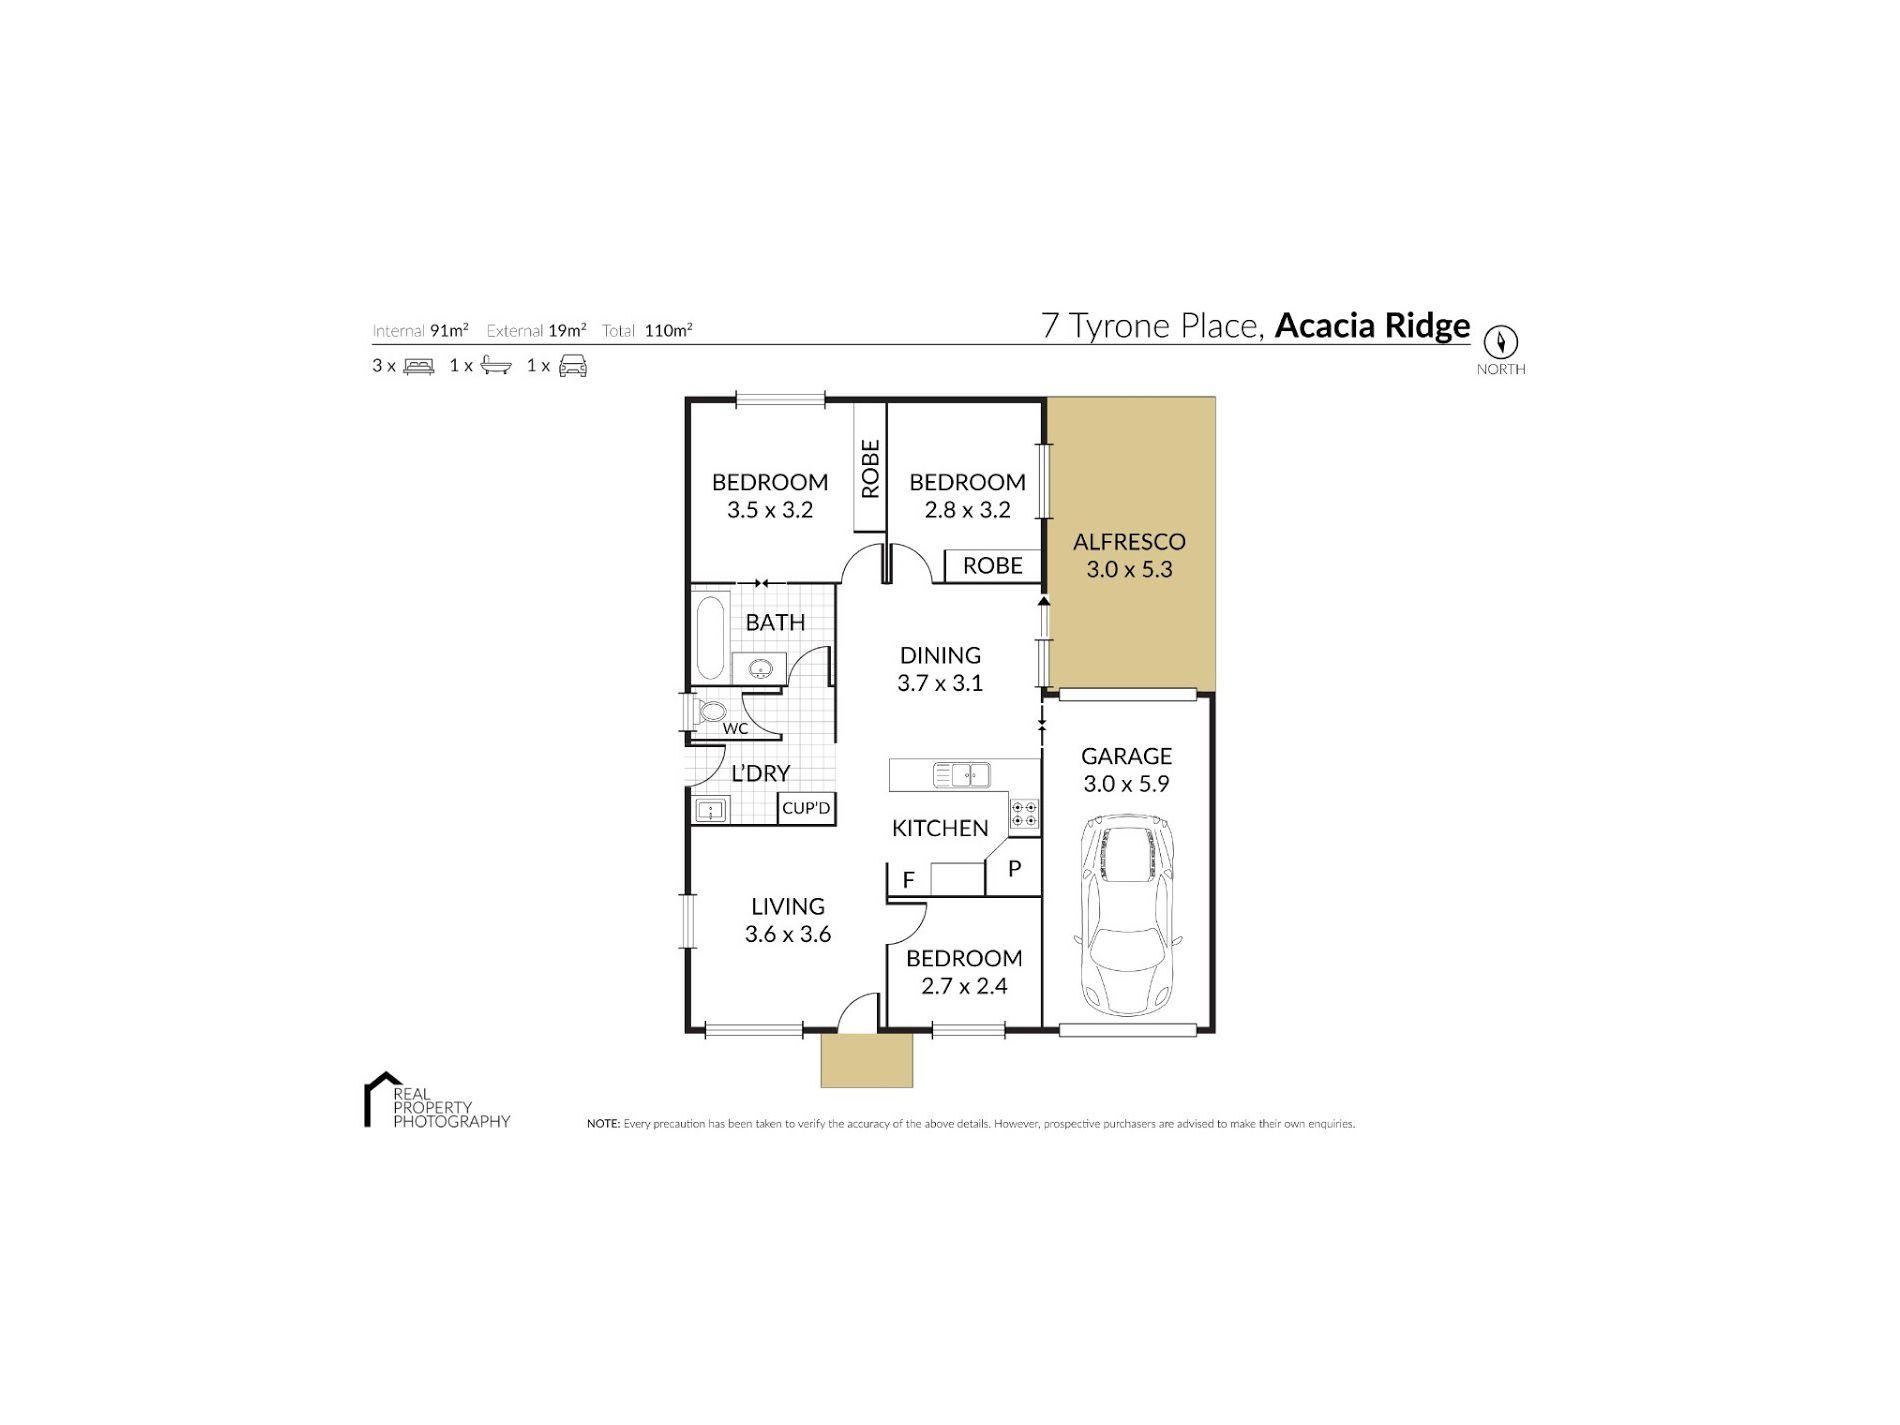 7 Tyrone Place, Acacia Ridge